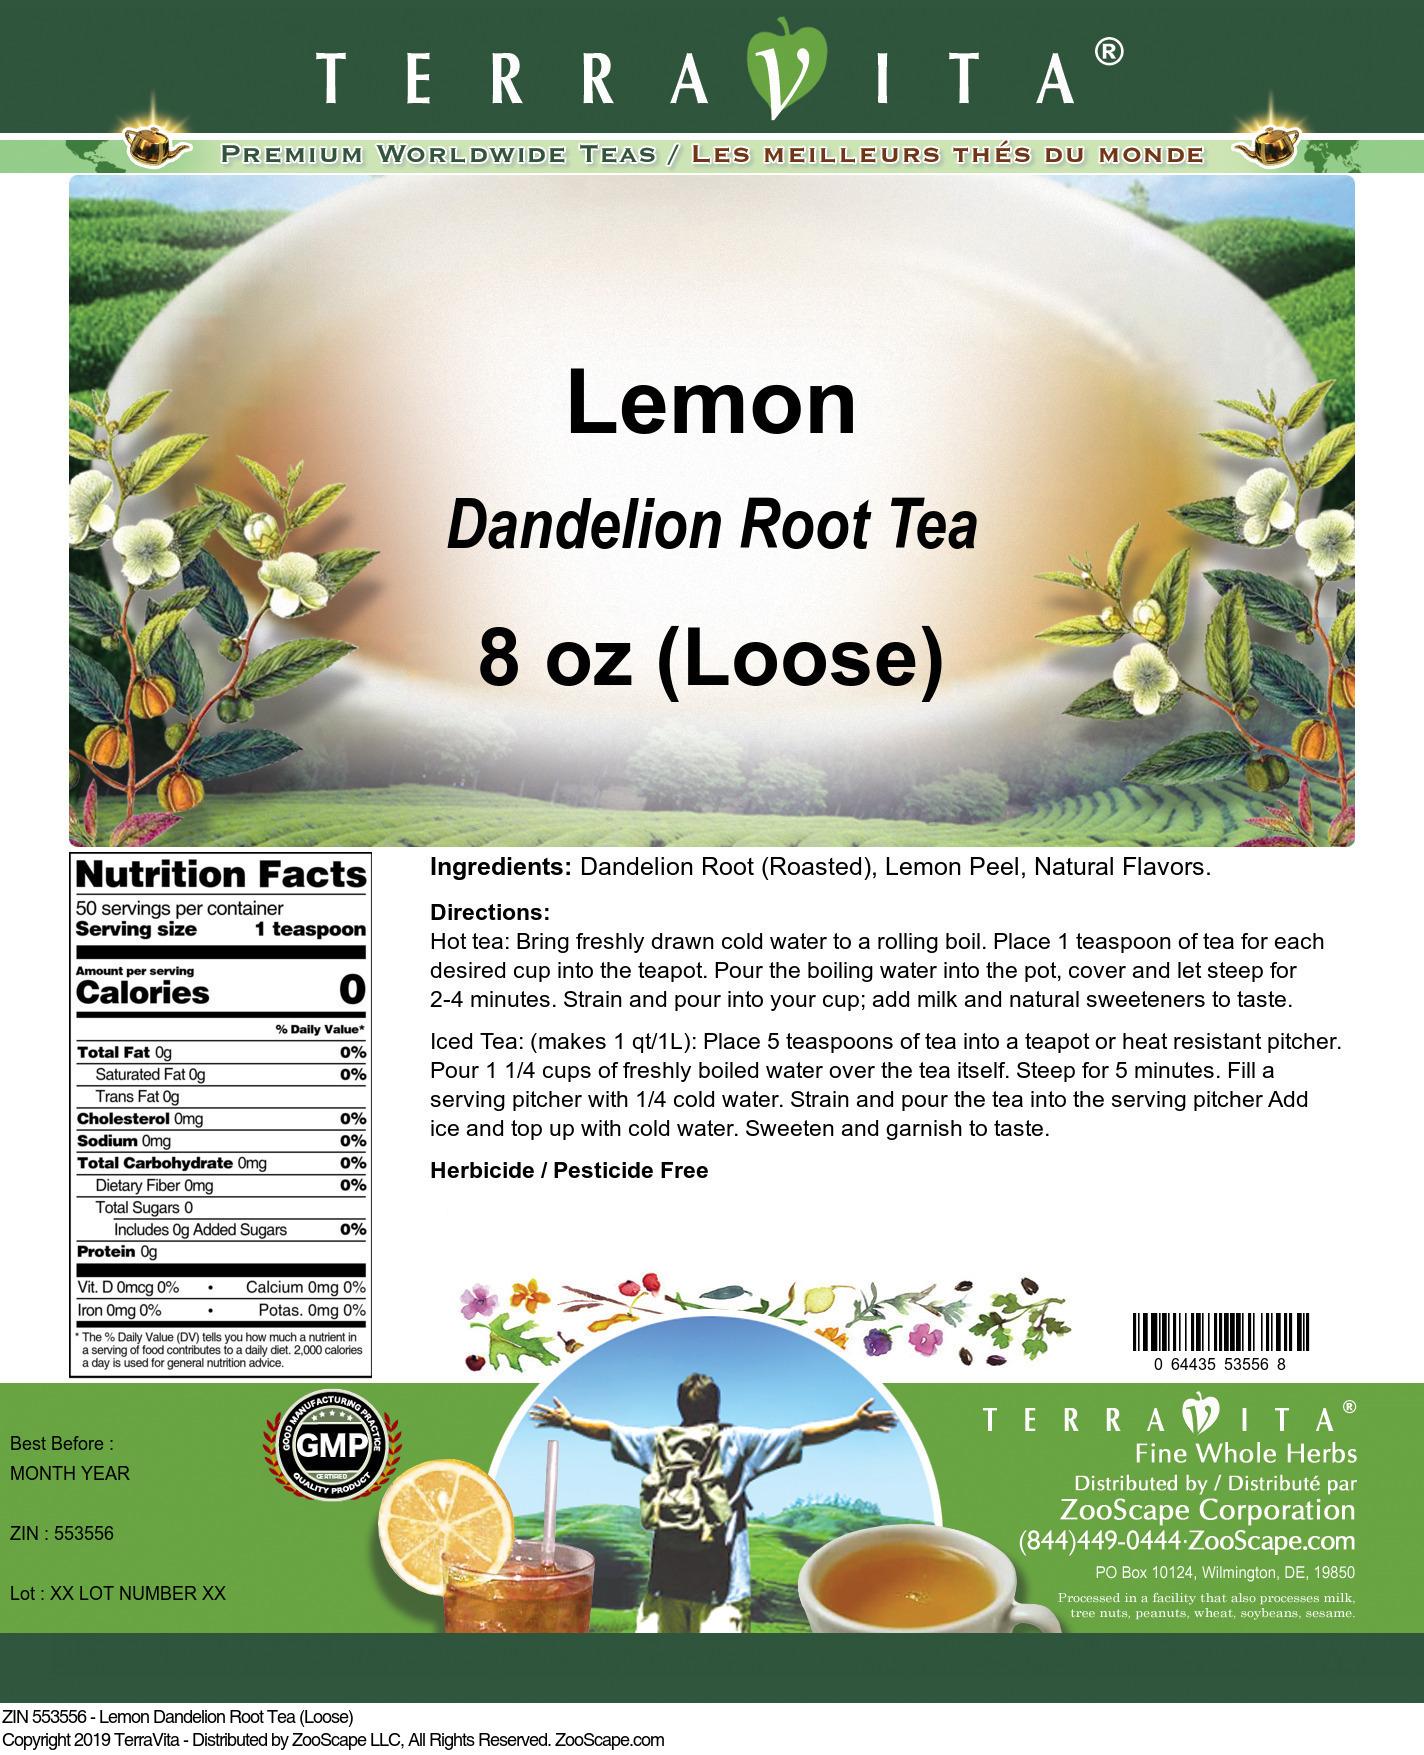 Lemon Dandelion Root